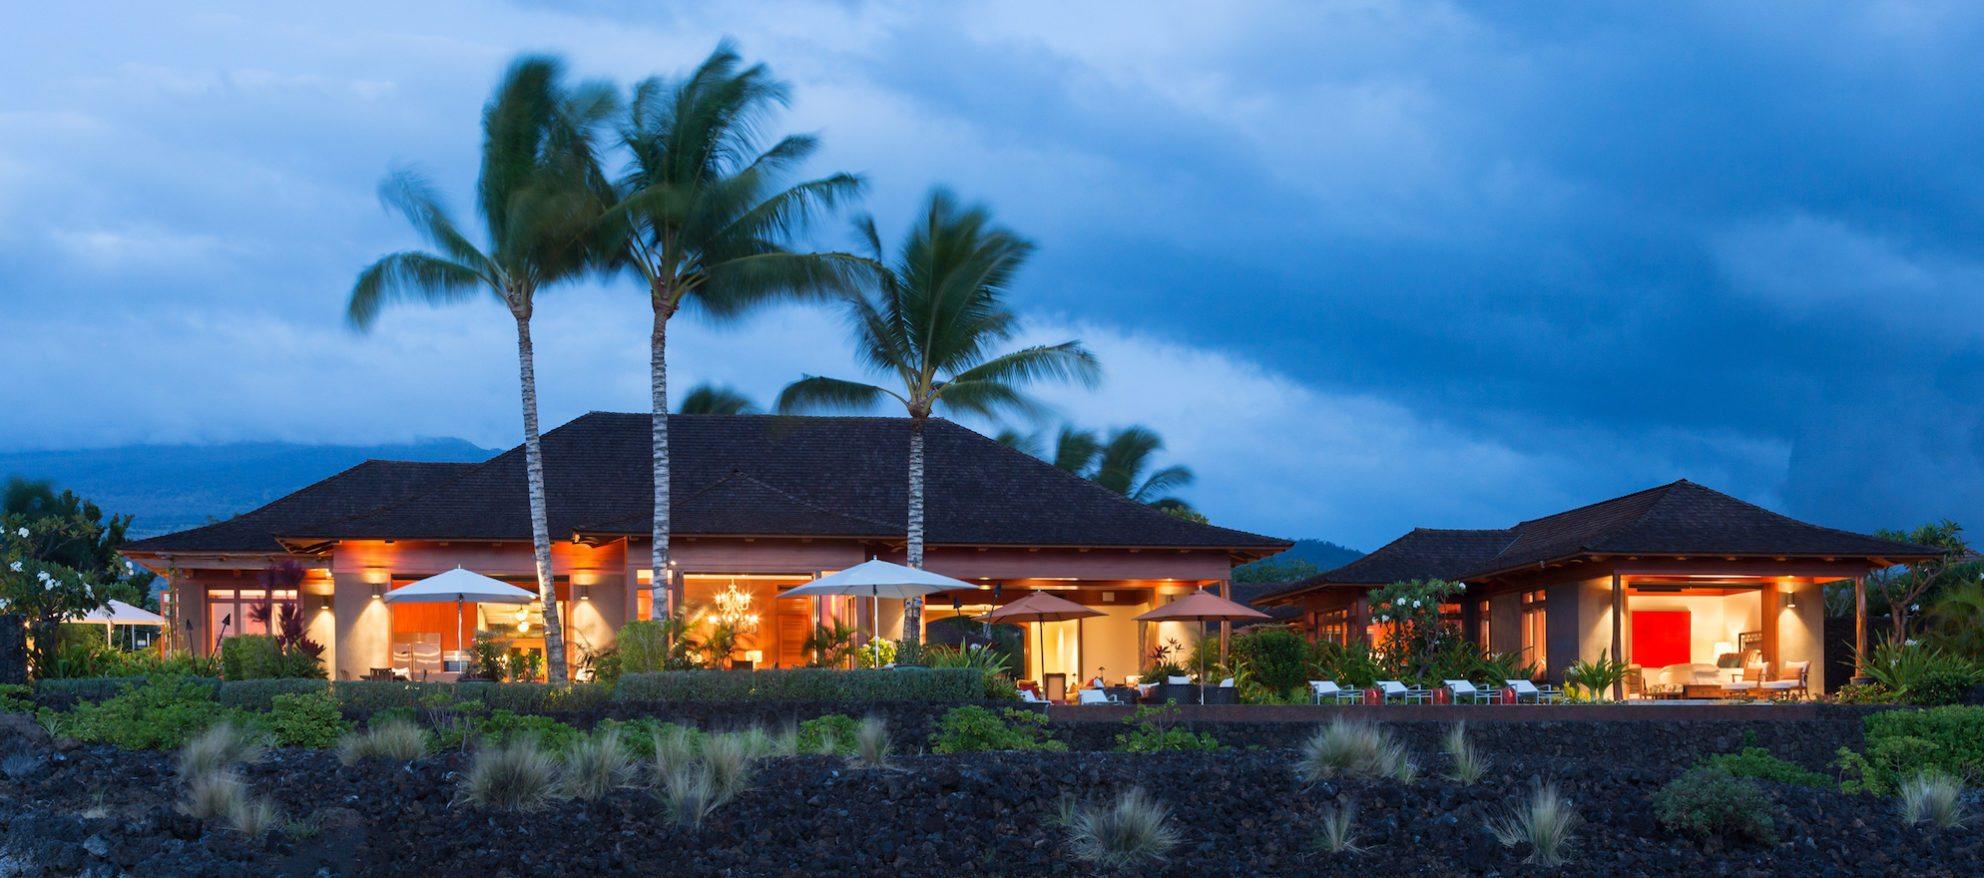 Luxury listing: Hualalai resort home in Hawaii